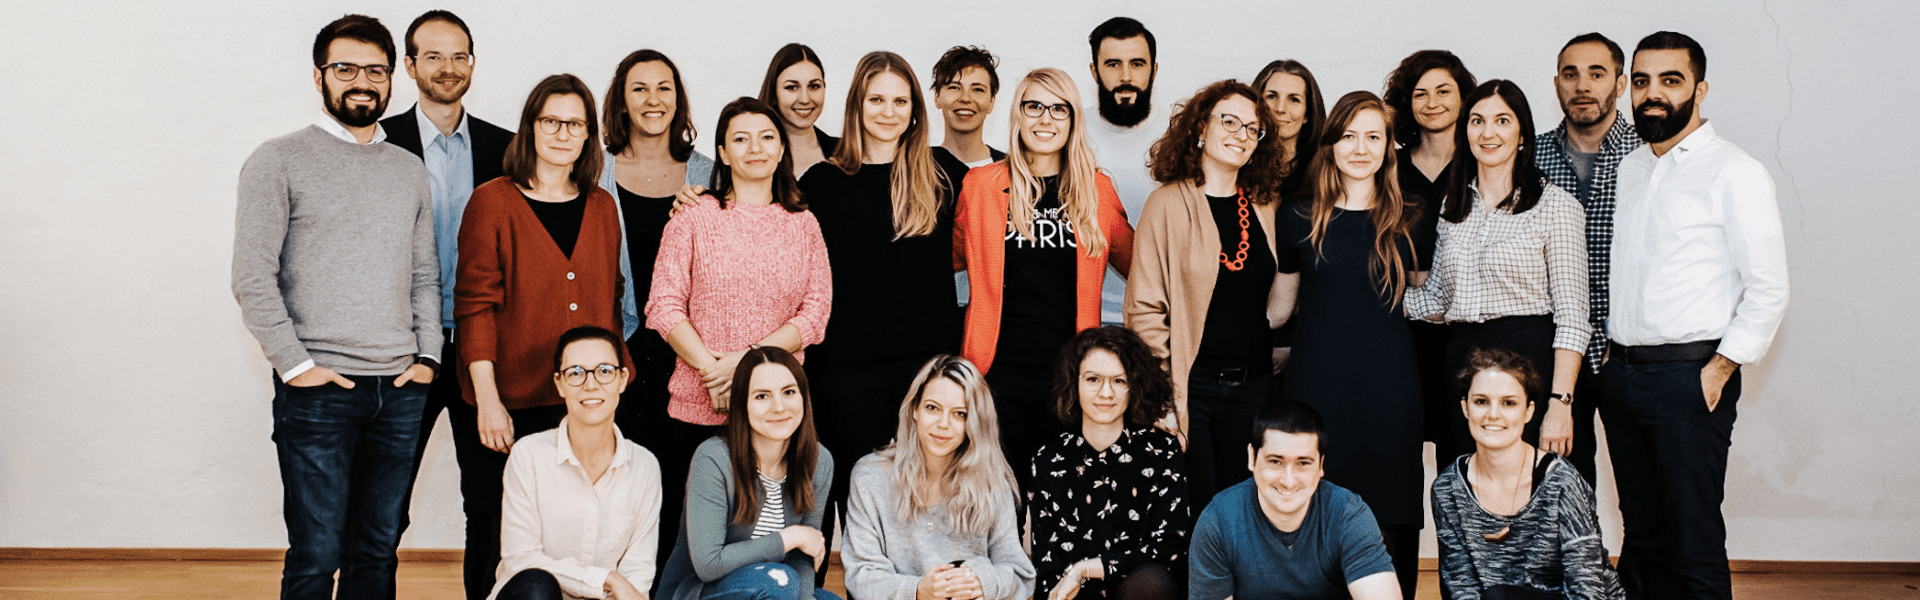 Impact Hub Vienna Team